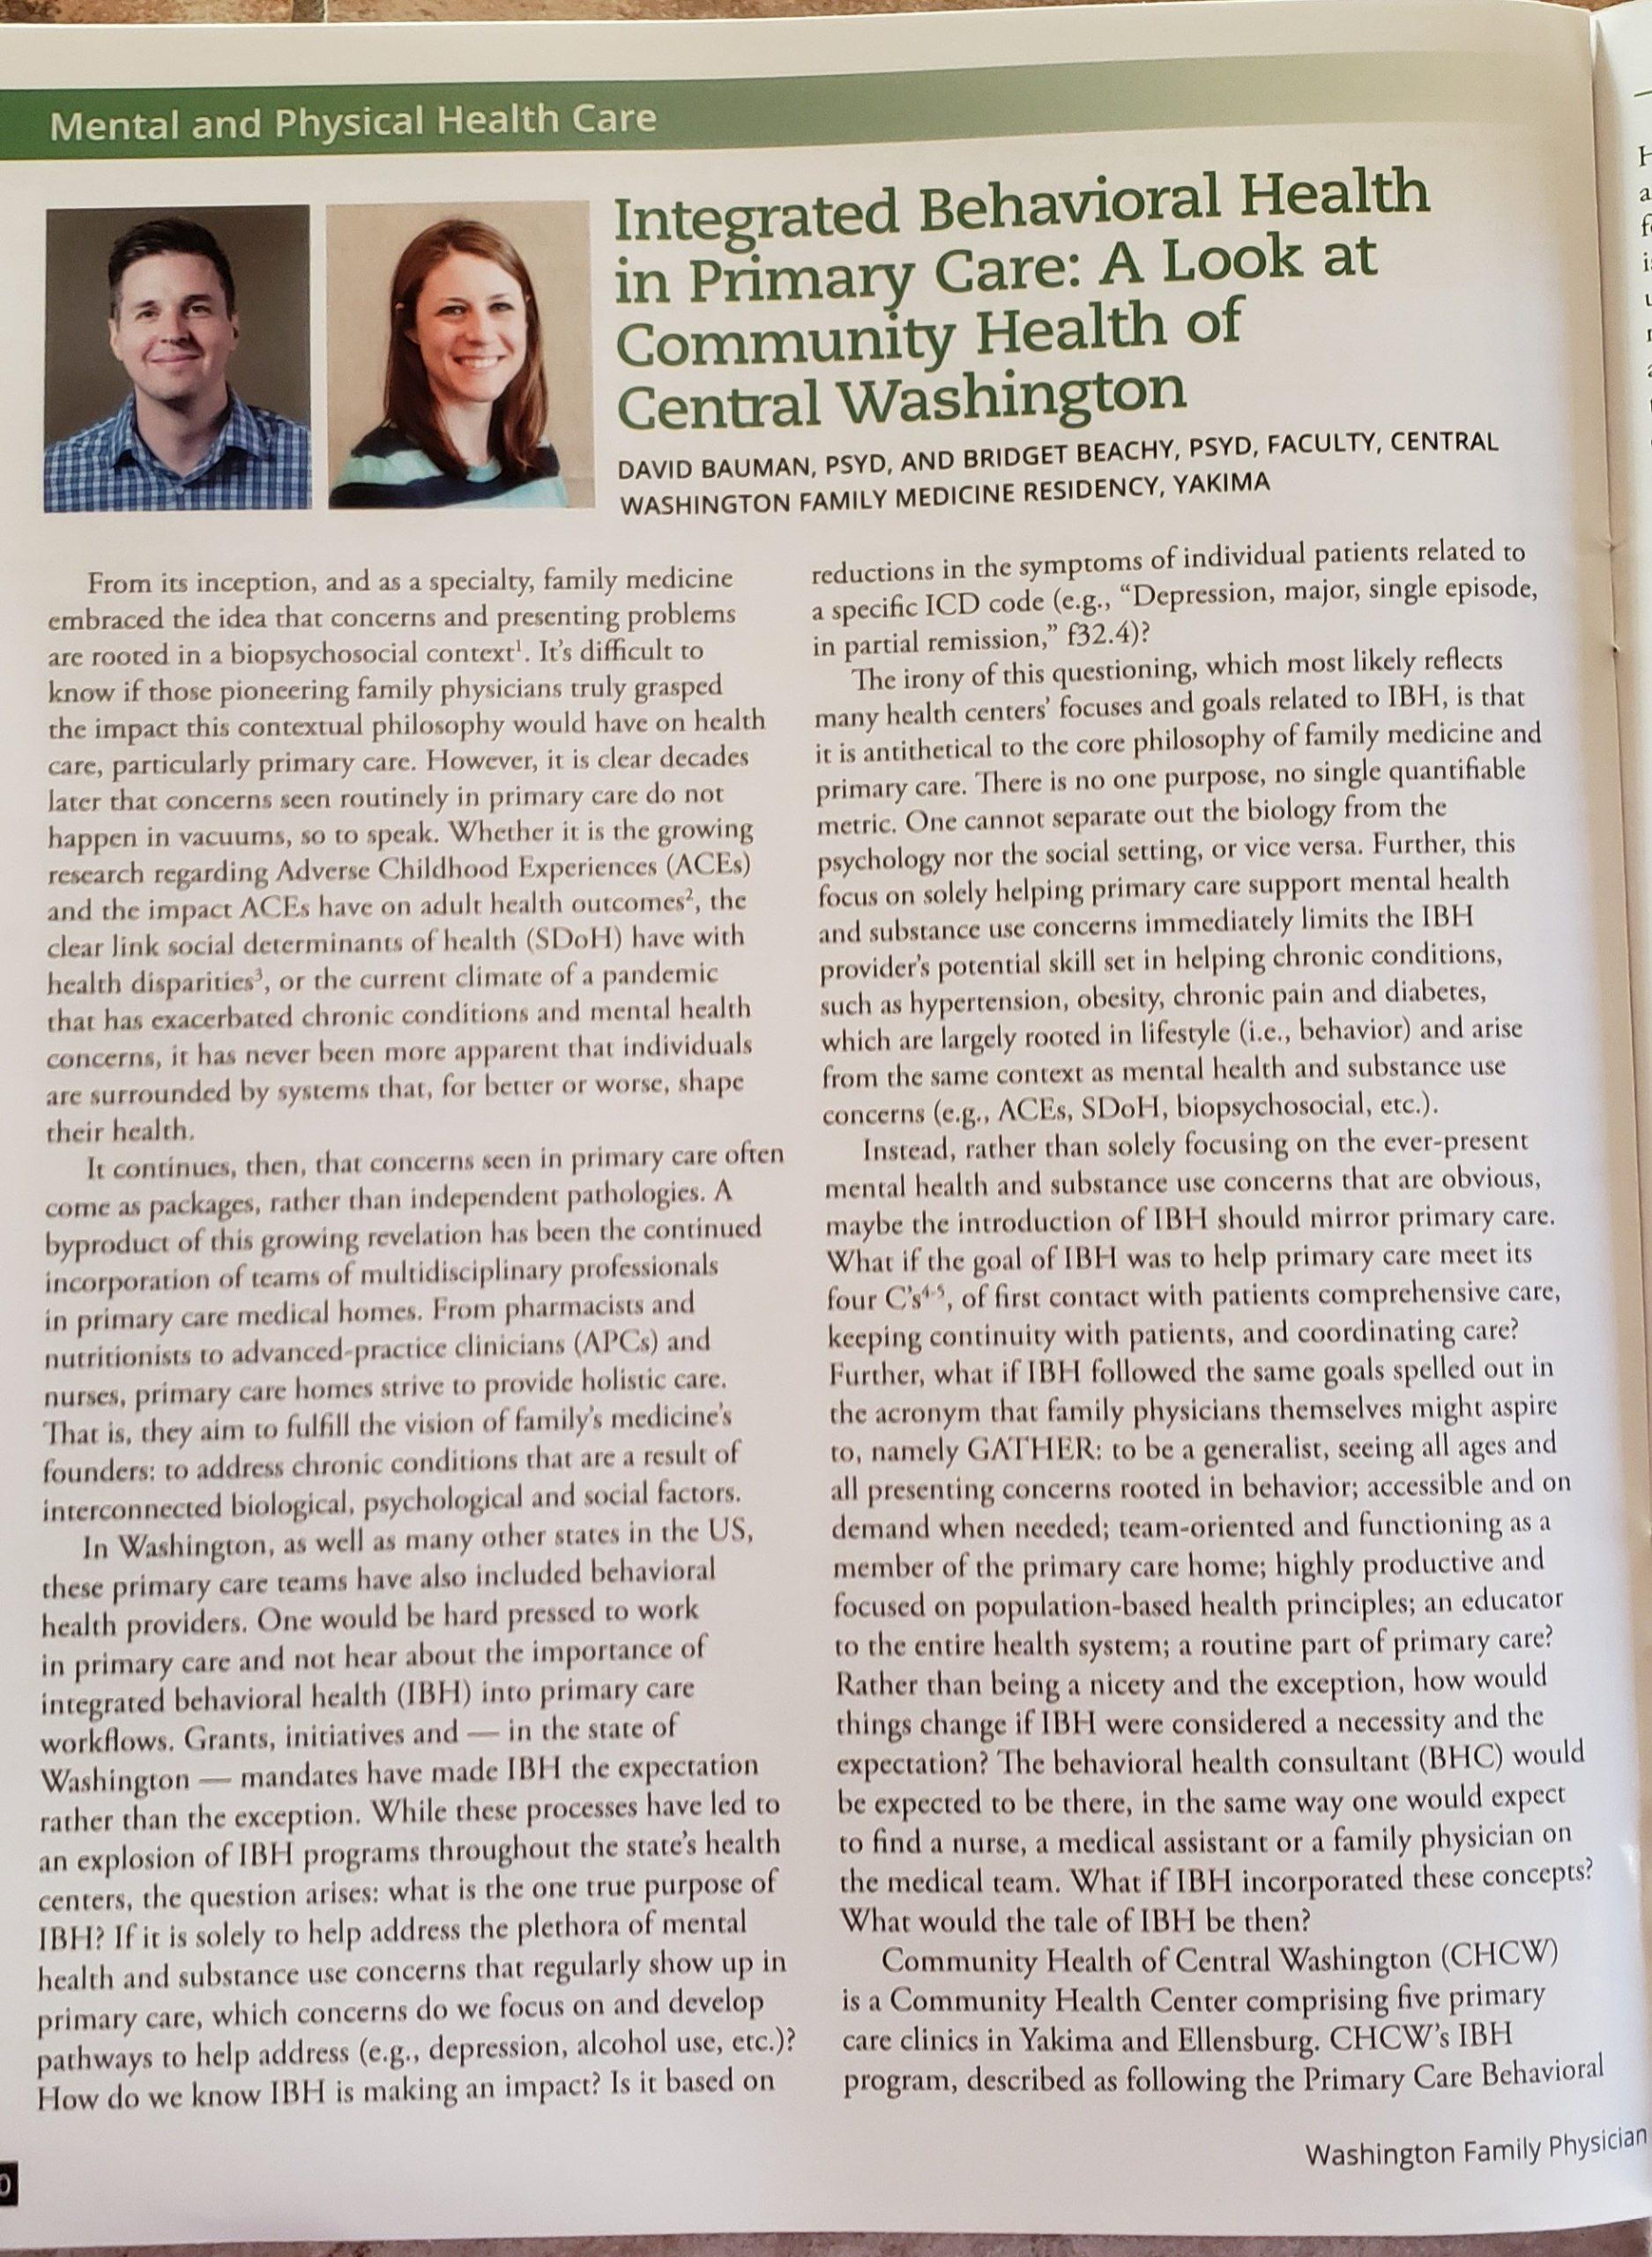 CWFMR in Washington Family Physician Article